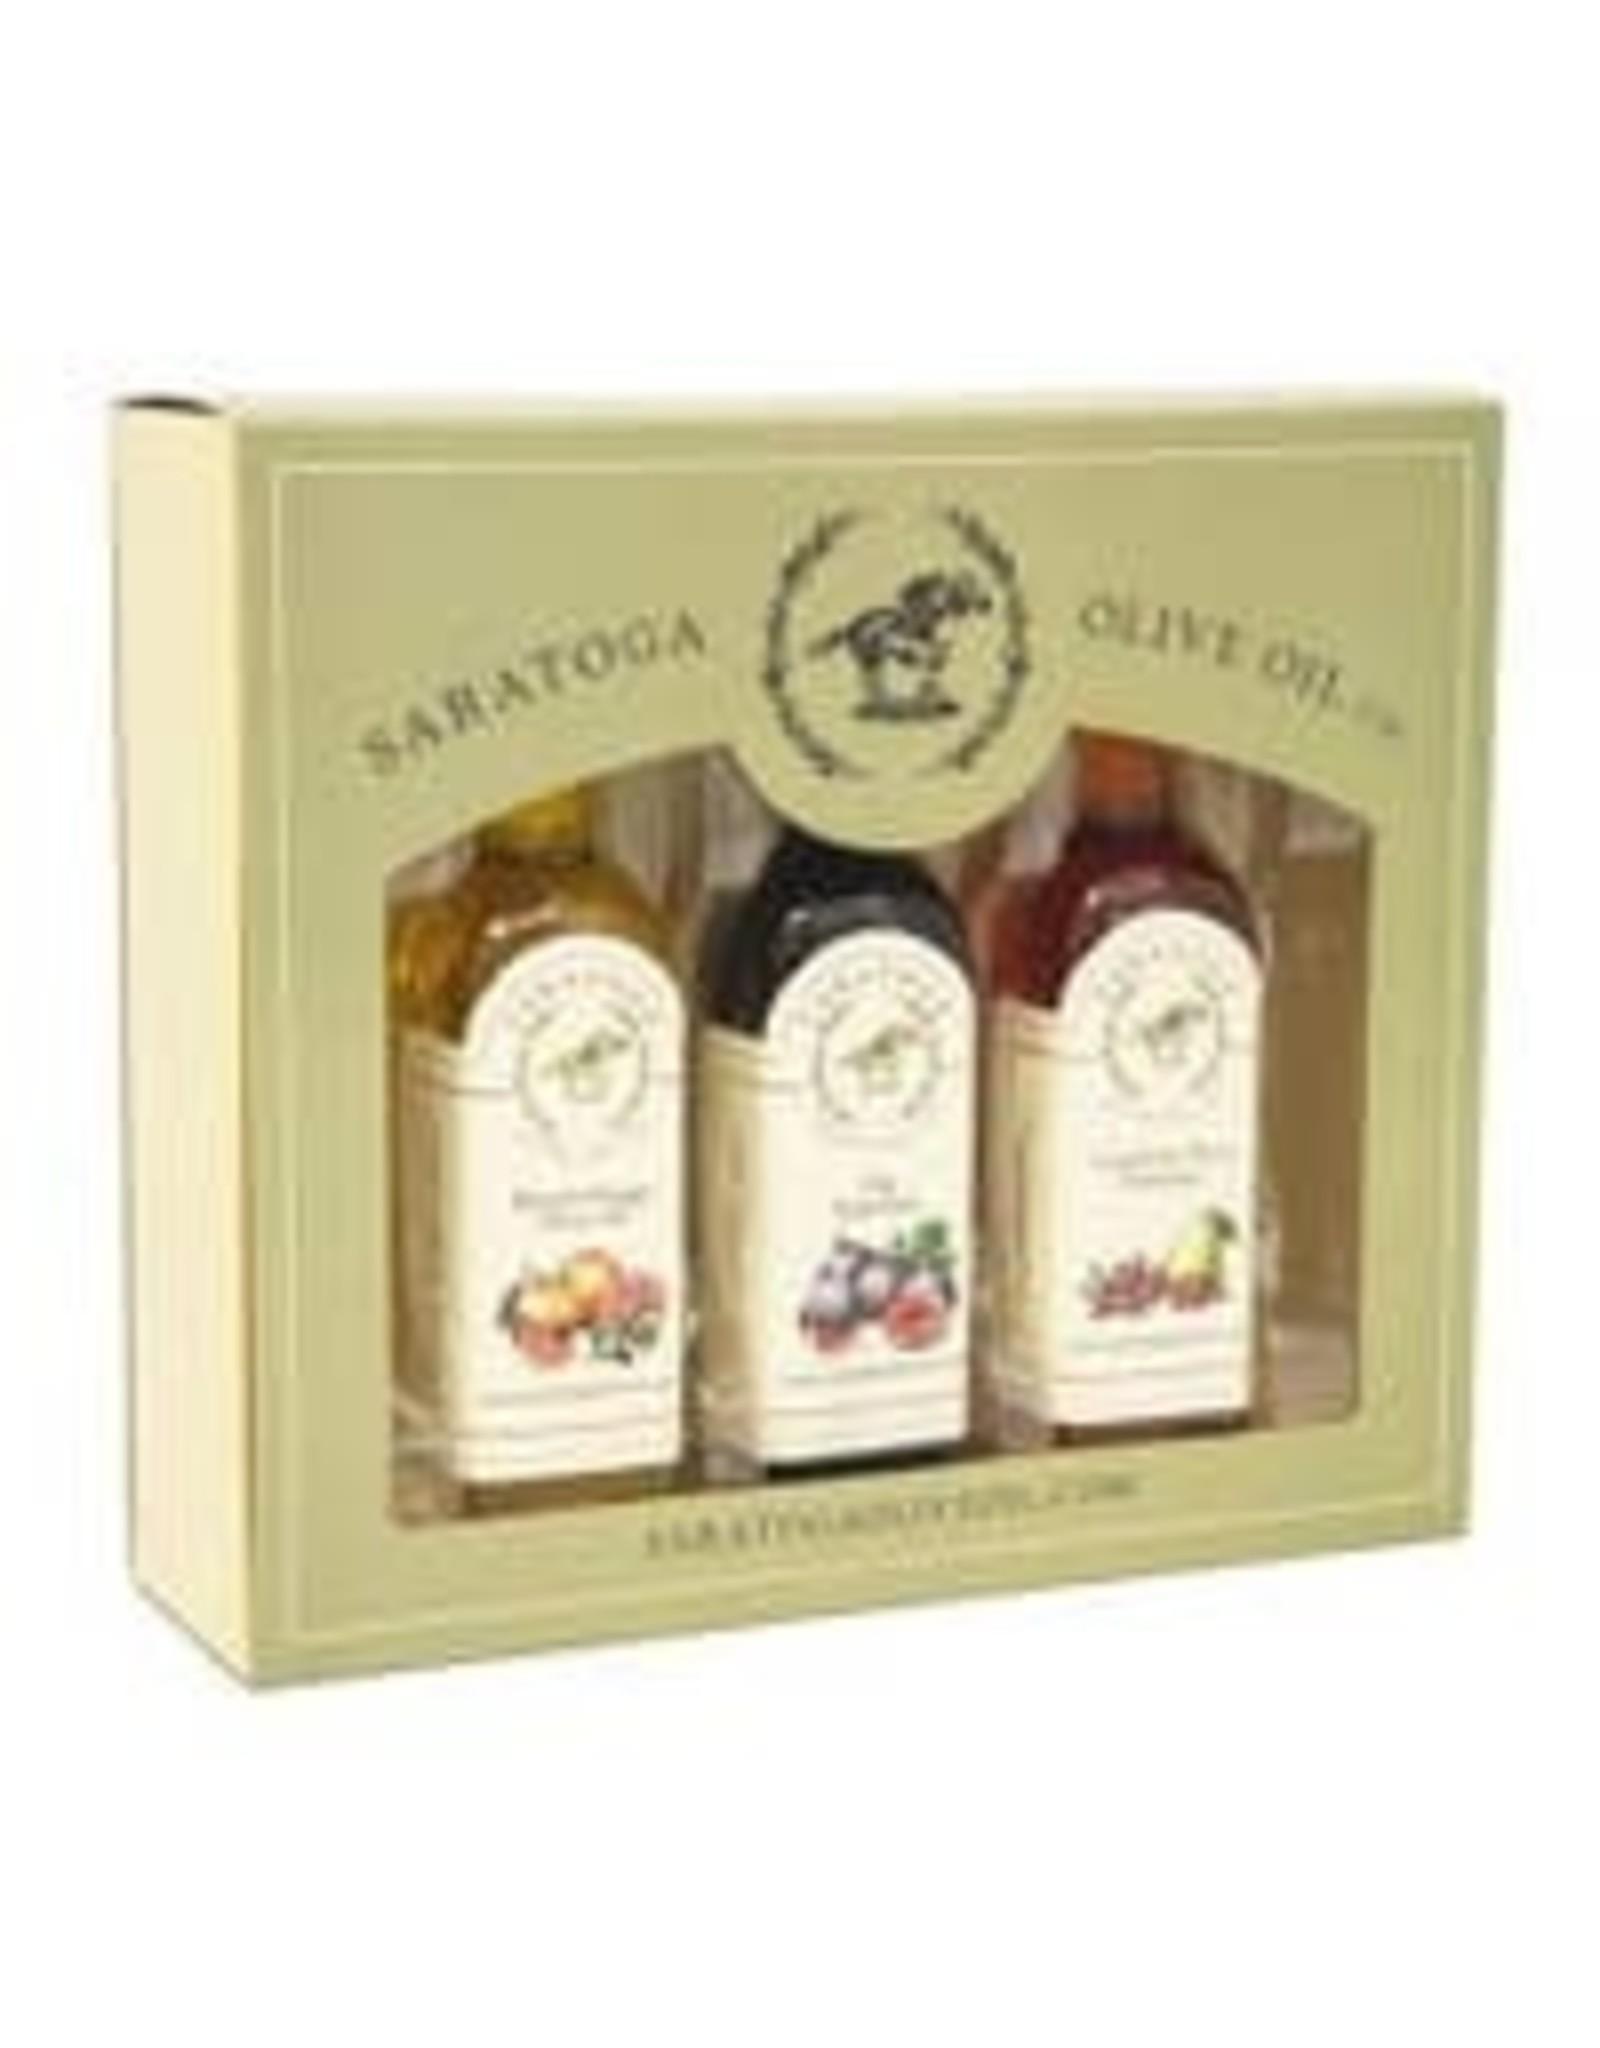 Saratoga Olive Oil Company Big Apple Collection